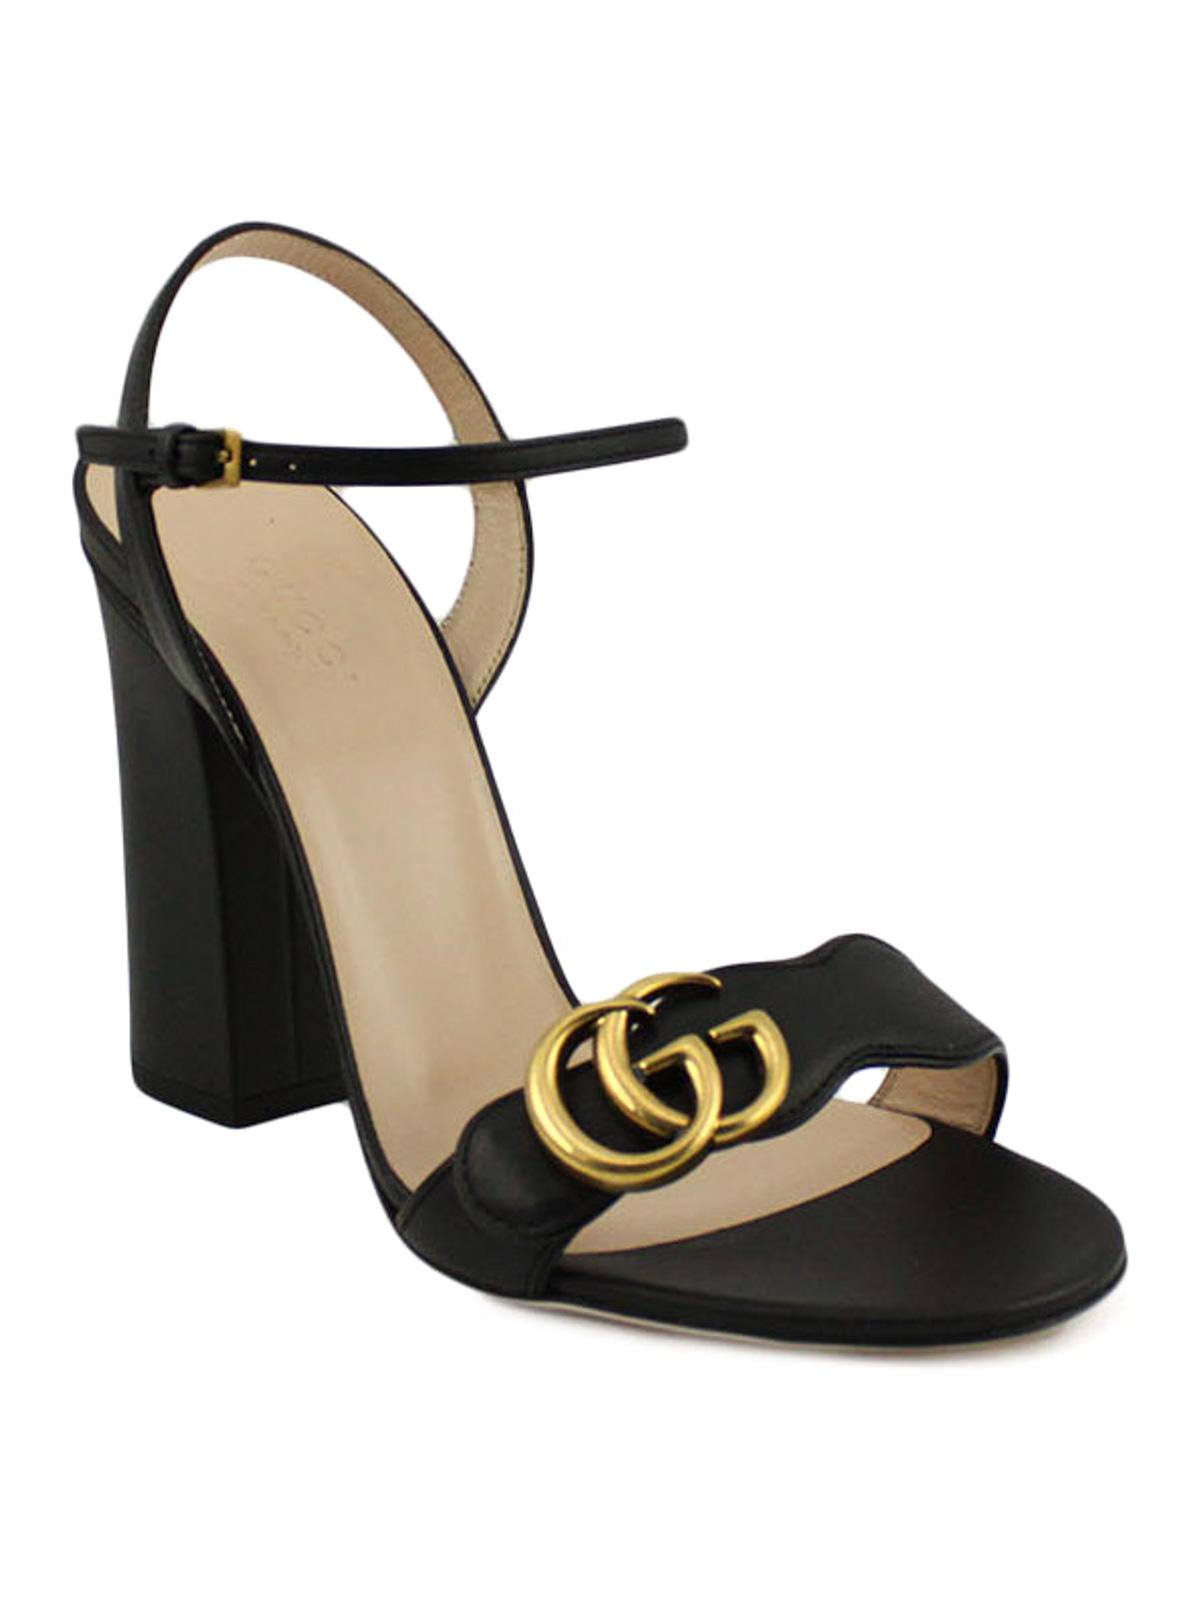 b617ebec9 Gucci - Double G leather sandals - sandals - 453378A3N001000 | iKRIX.com